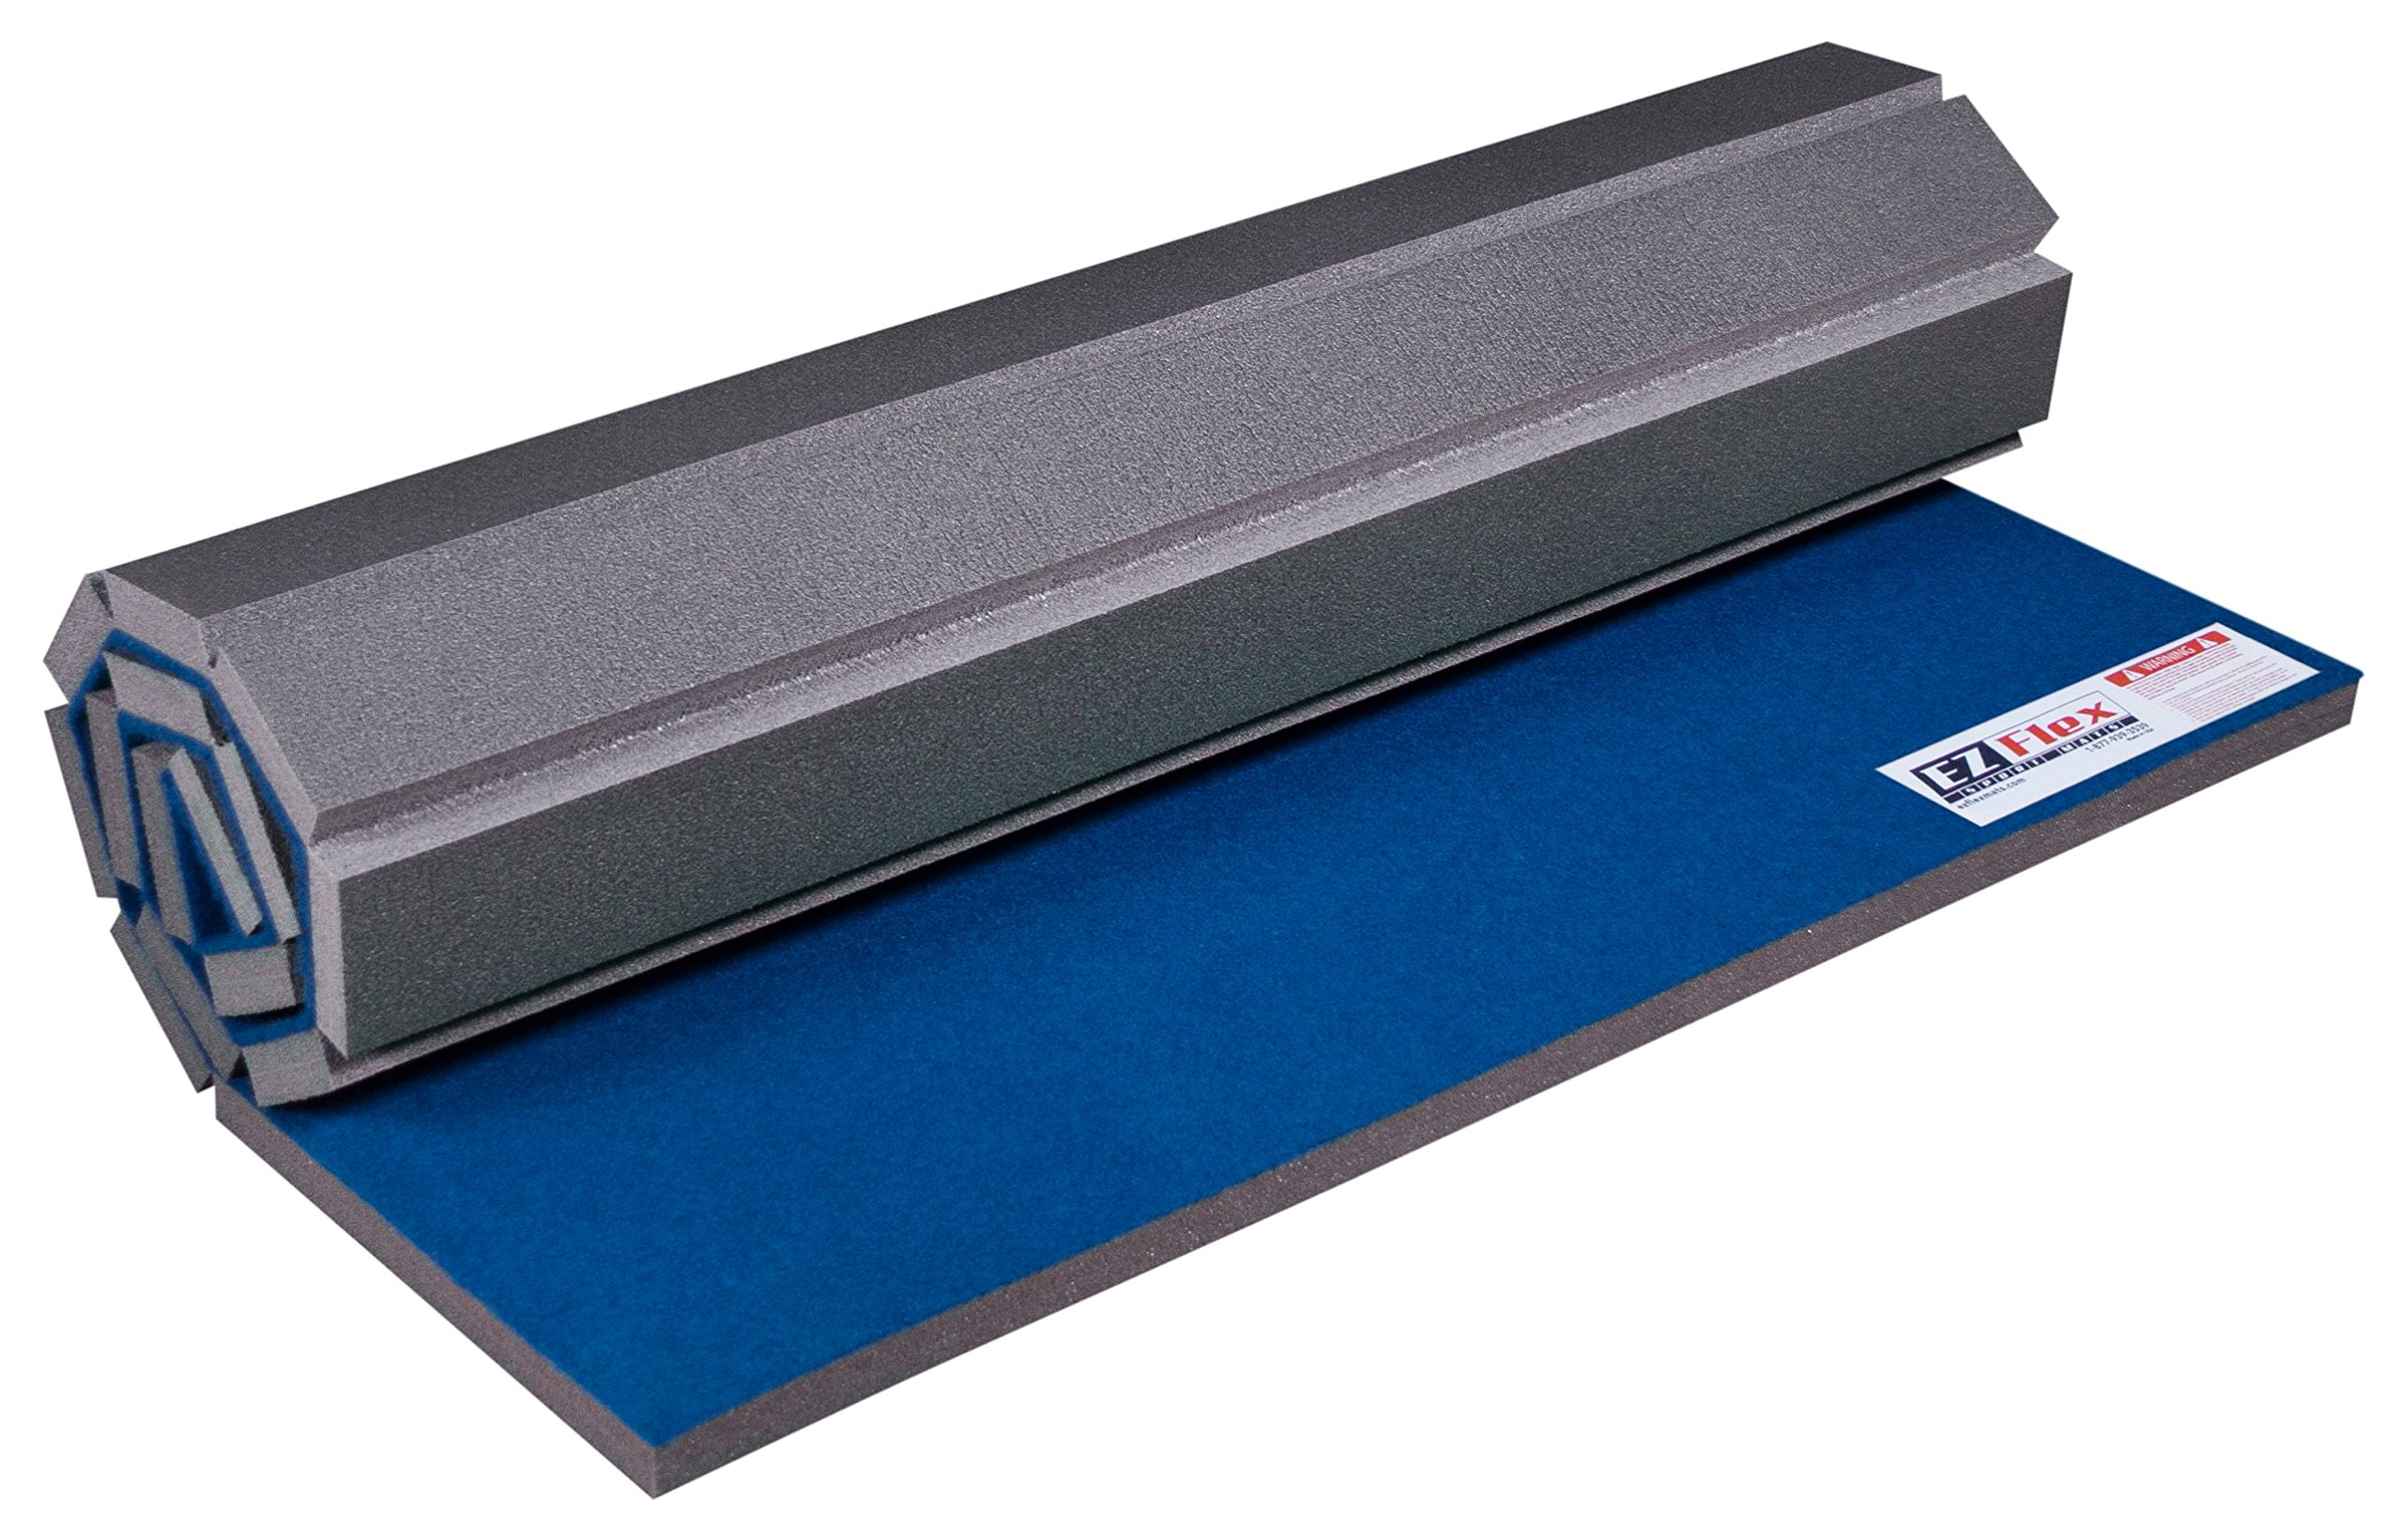 EZ Flex Home Cheerleading Practice Mat - 4' x 6' x 1-3/8 (Blue)